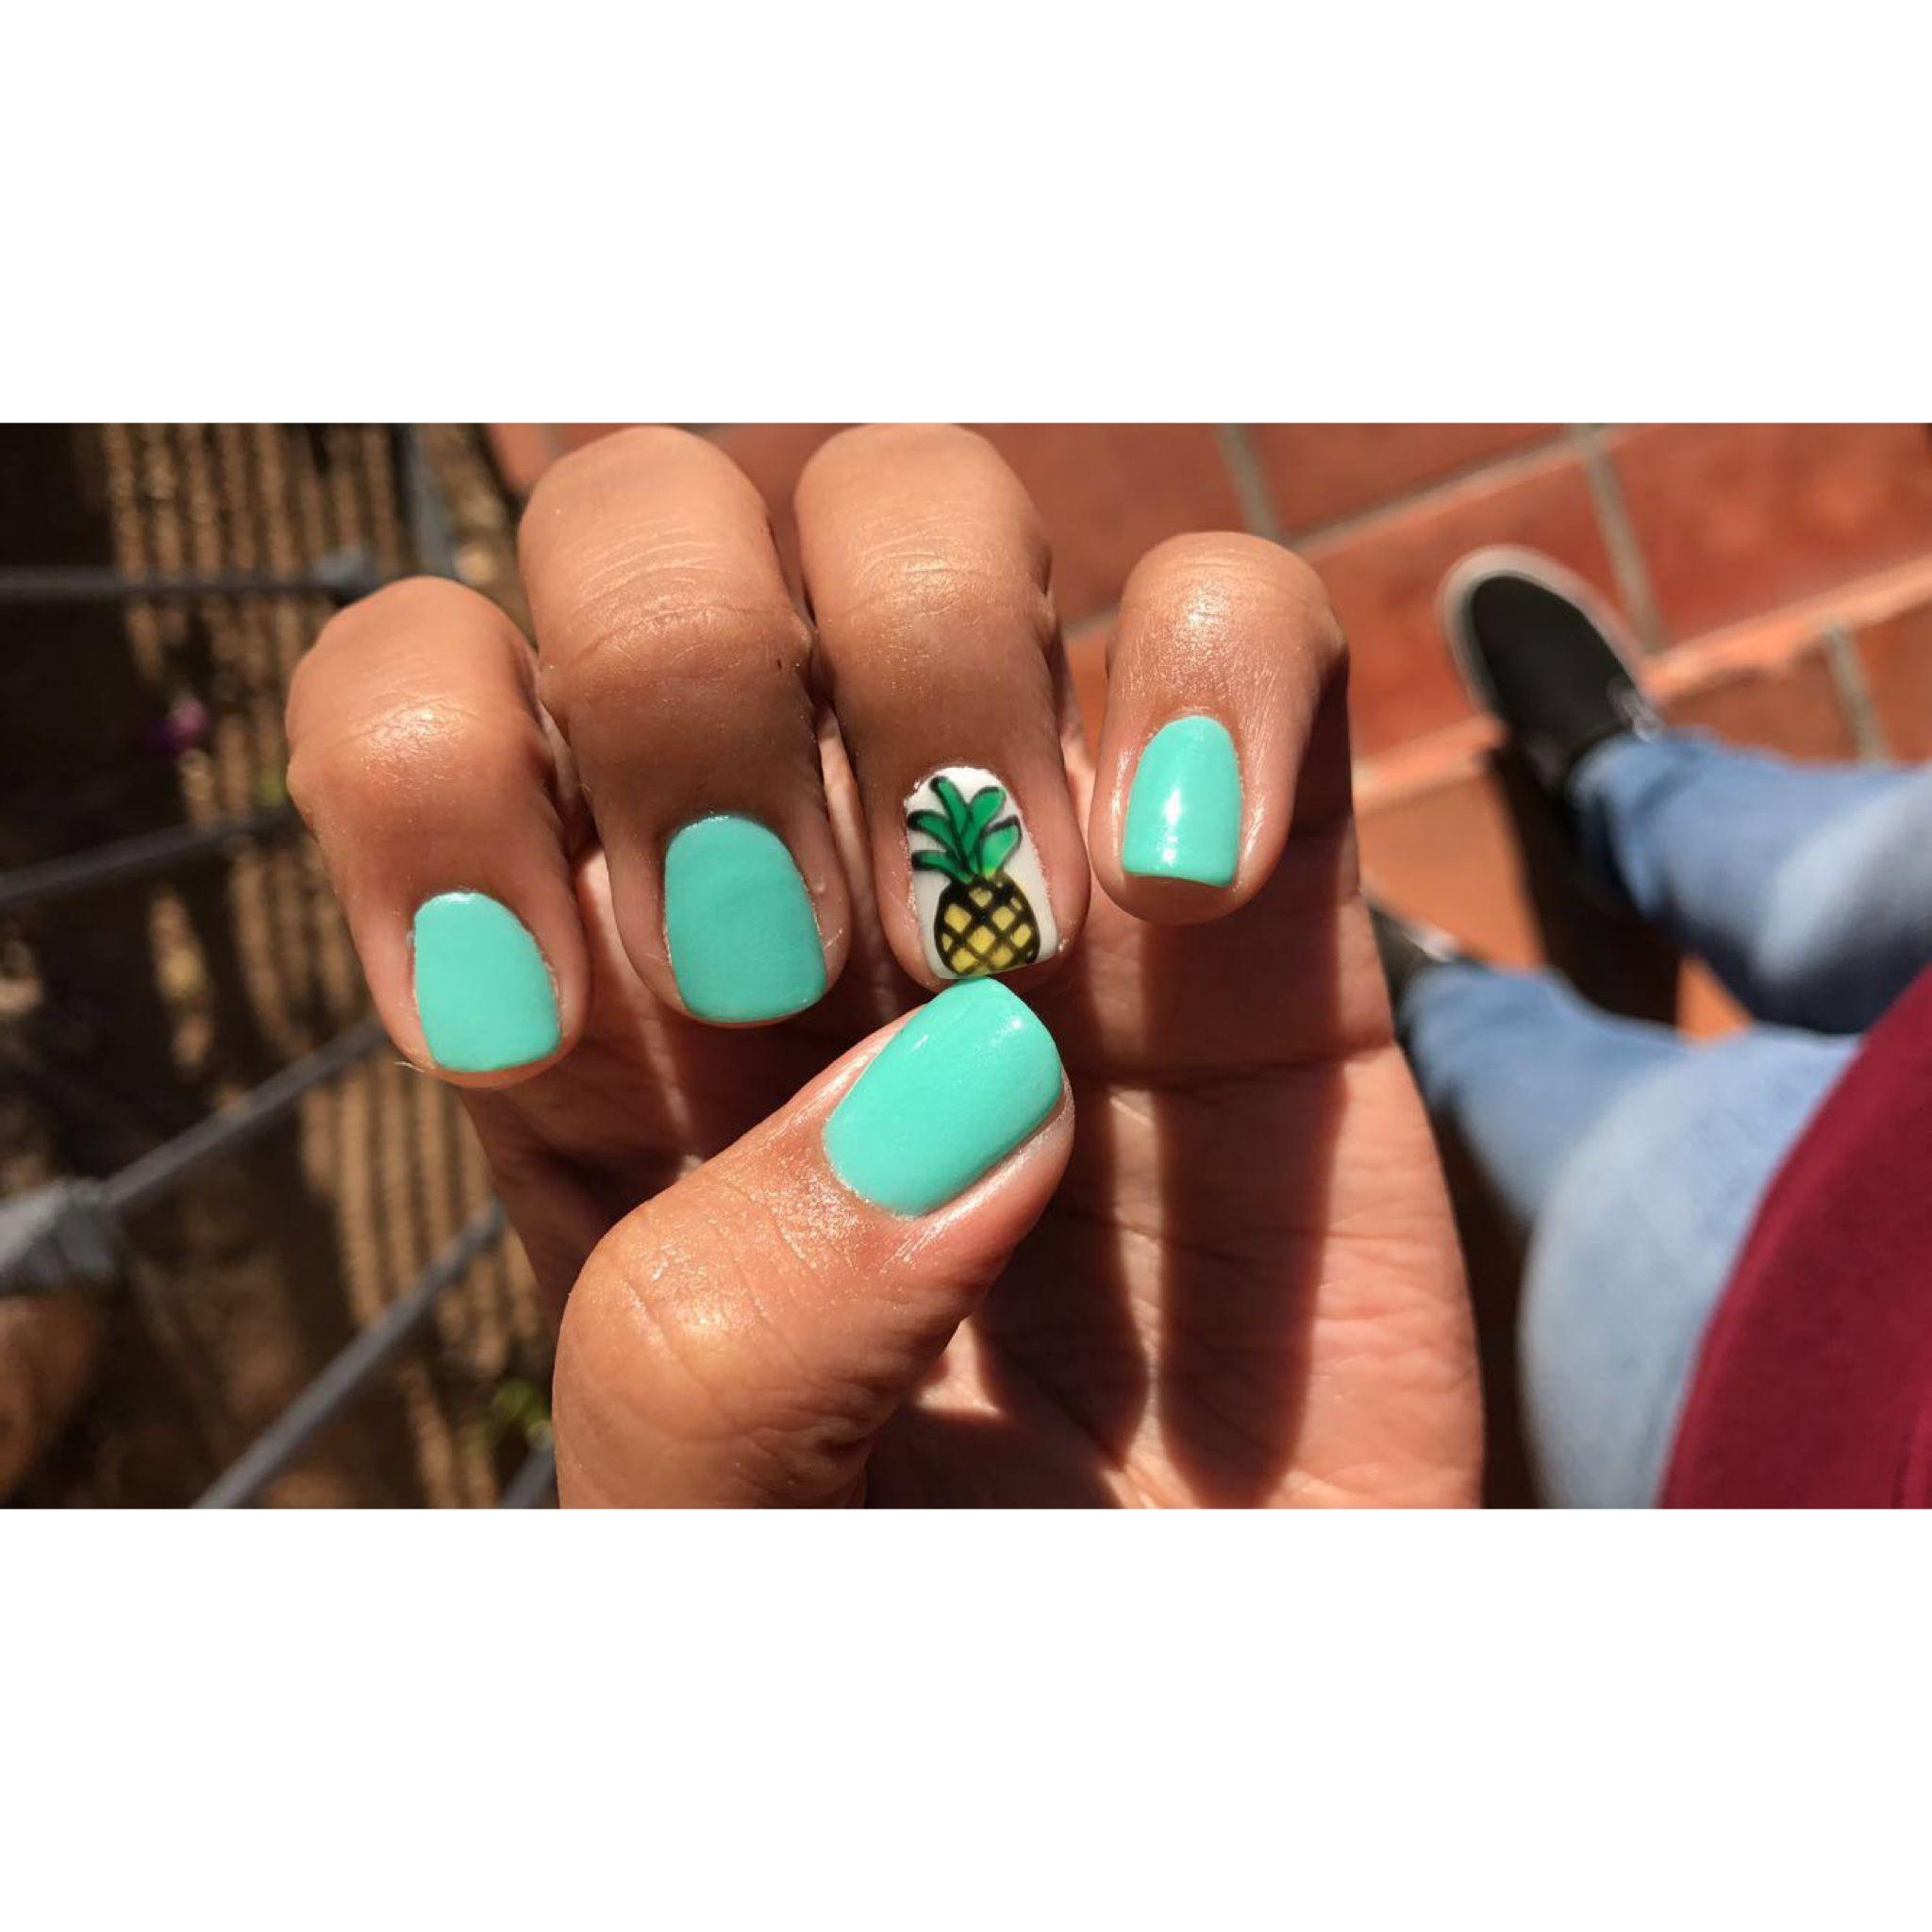 Pineapple Nail Design, fun for summer | Beauty | Pinterest ...